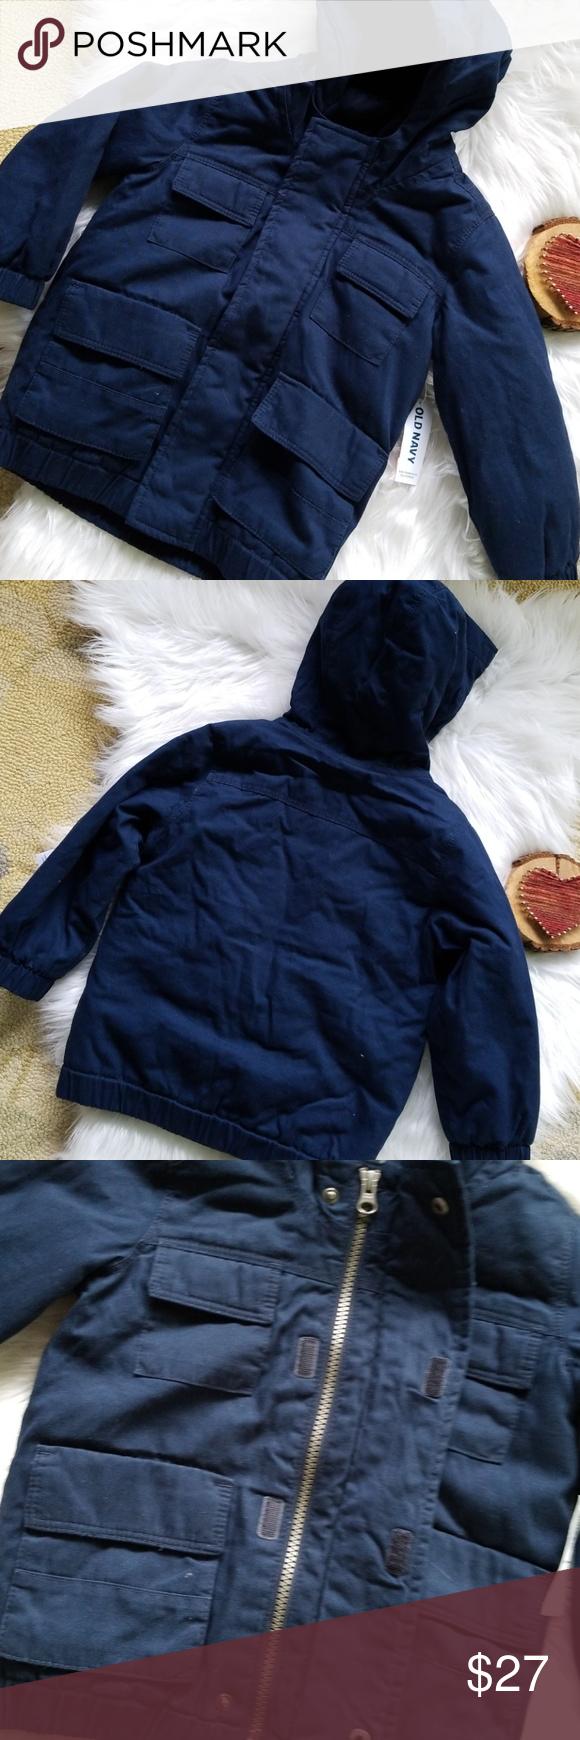 d079eab59263 Old Navy little boy s coat NWT in 2018